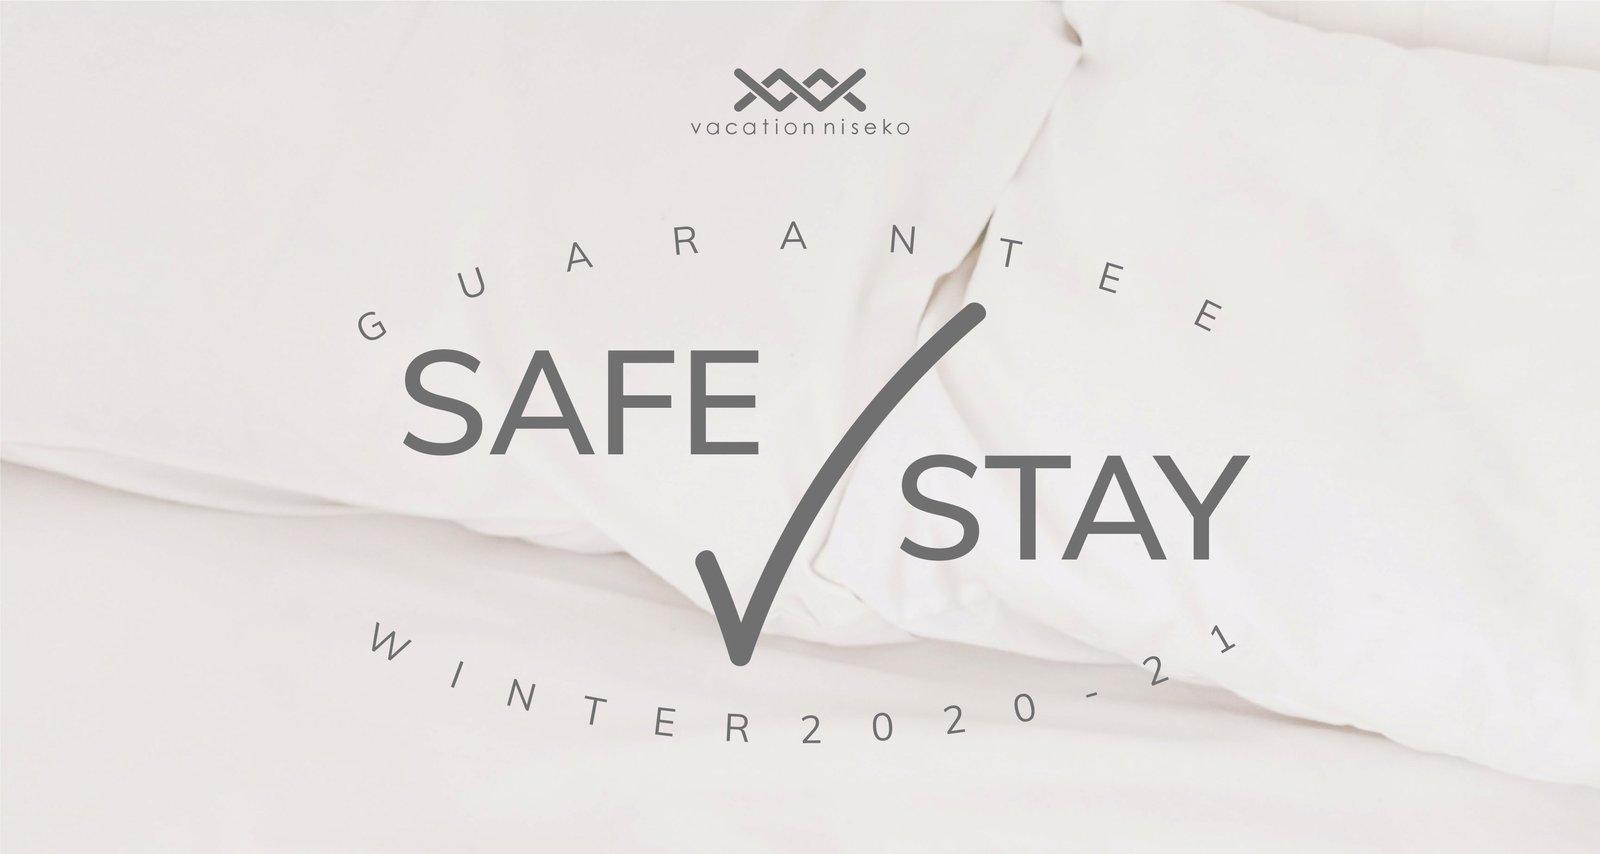 vacation niseko safe stay guarantee